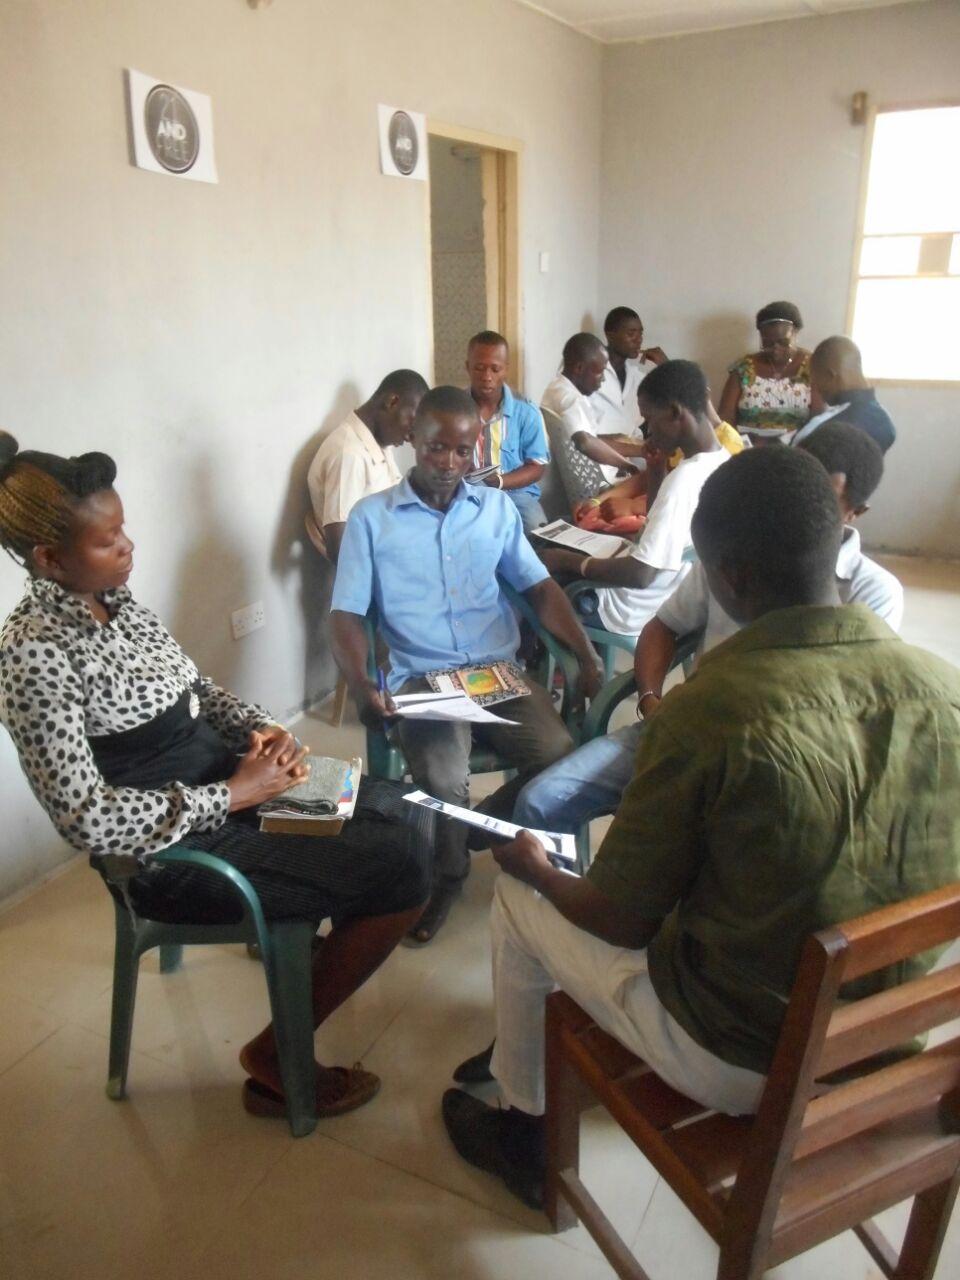 seminar-group-work.jpg